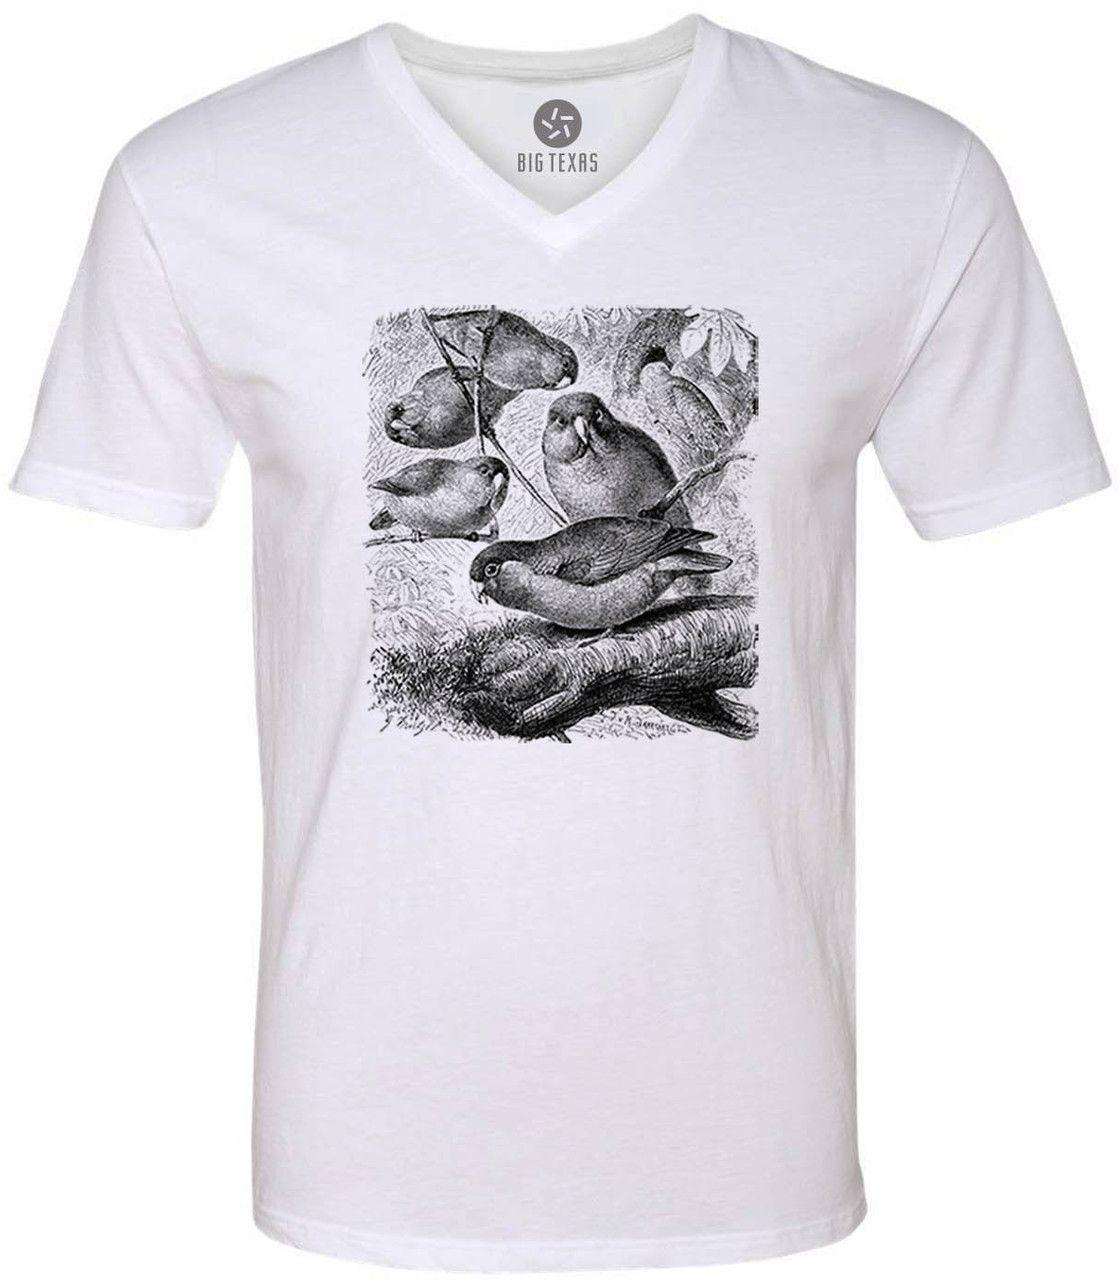 Jungle Parrots (Black) Short-Sleeve V-Neck T-Shirt